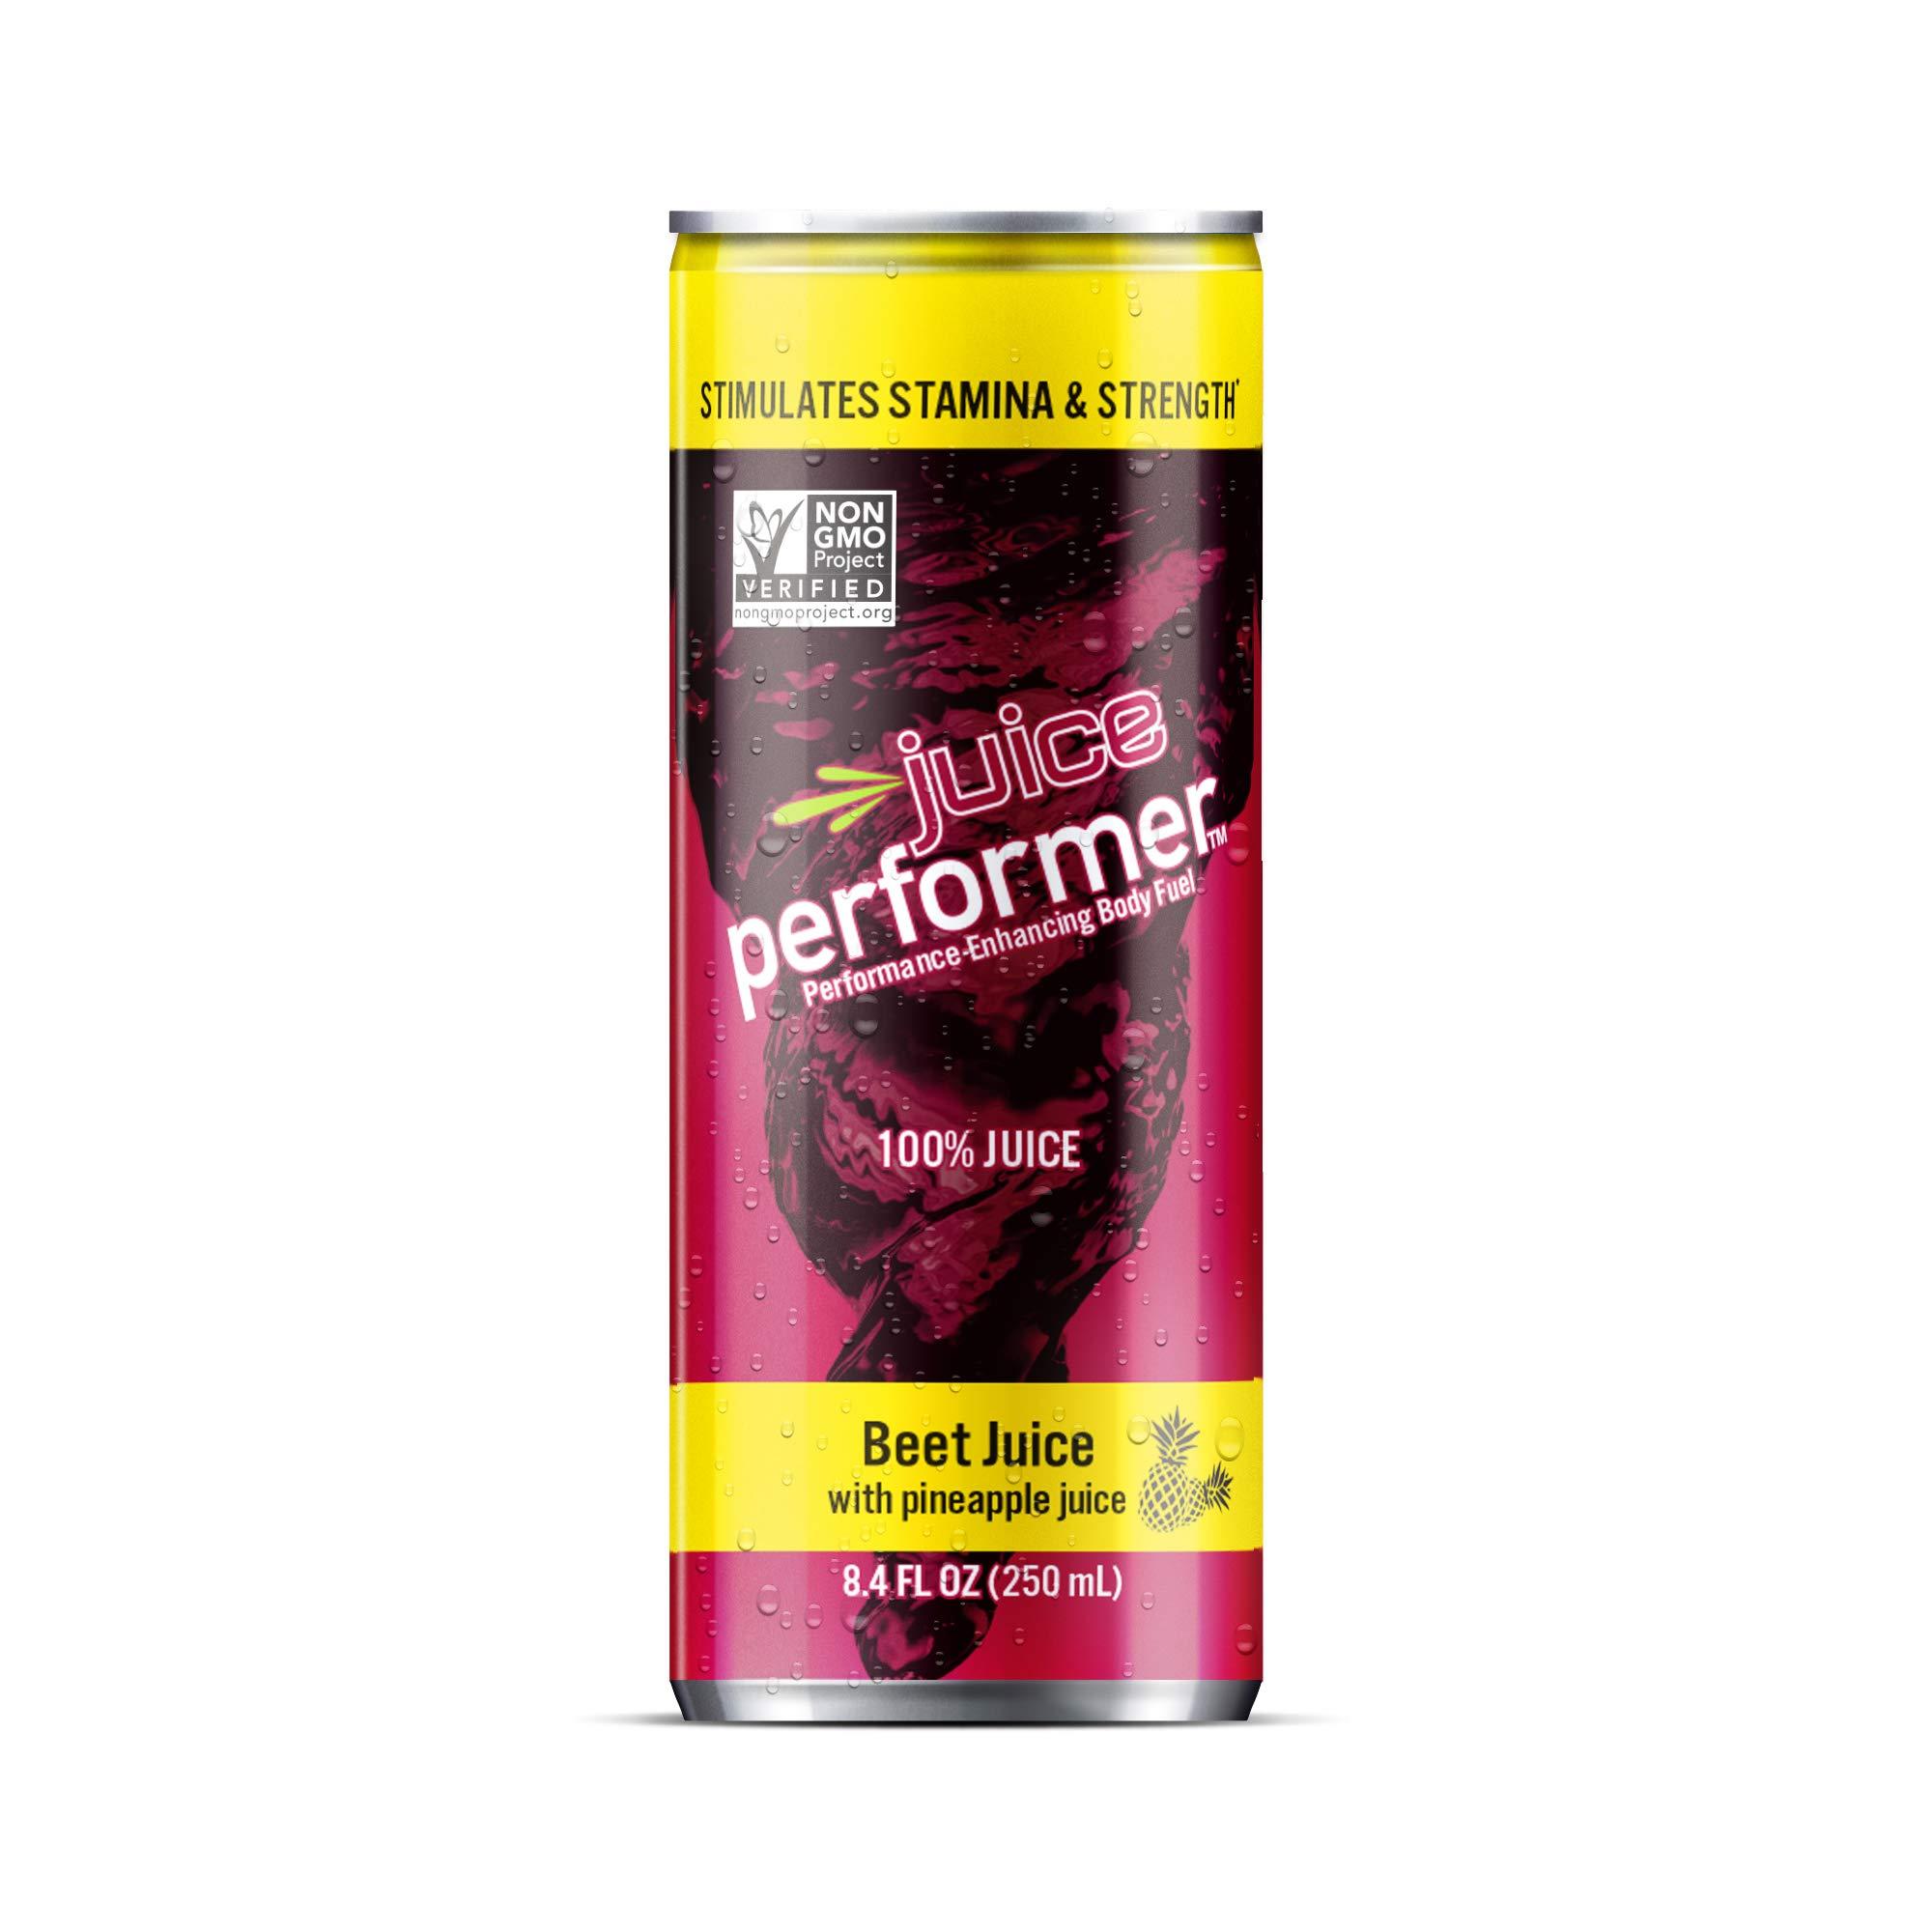 Juice Performer Beet Juice with Pineapple Juice 8.4 Fl. Oz. Can (12 Pack) by Juice Performer